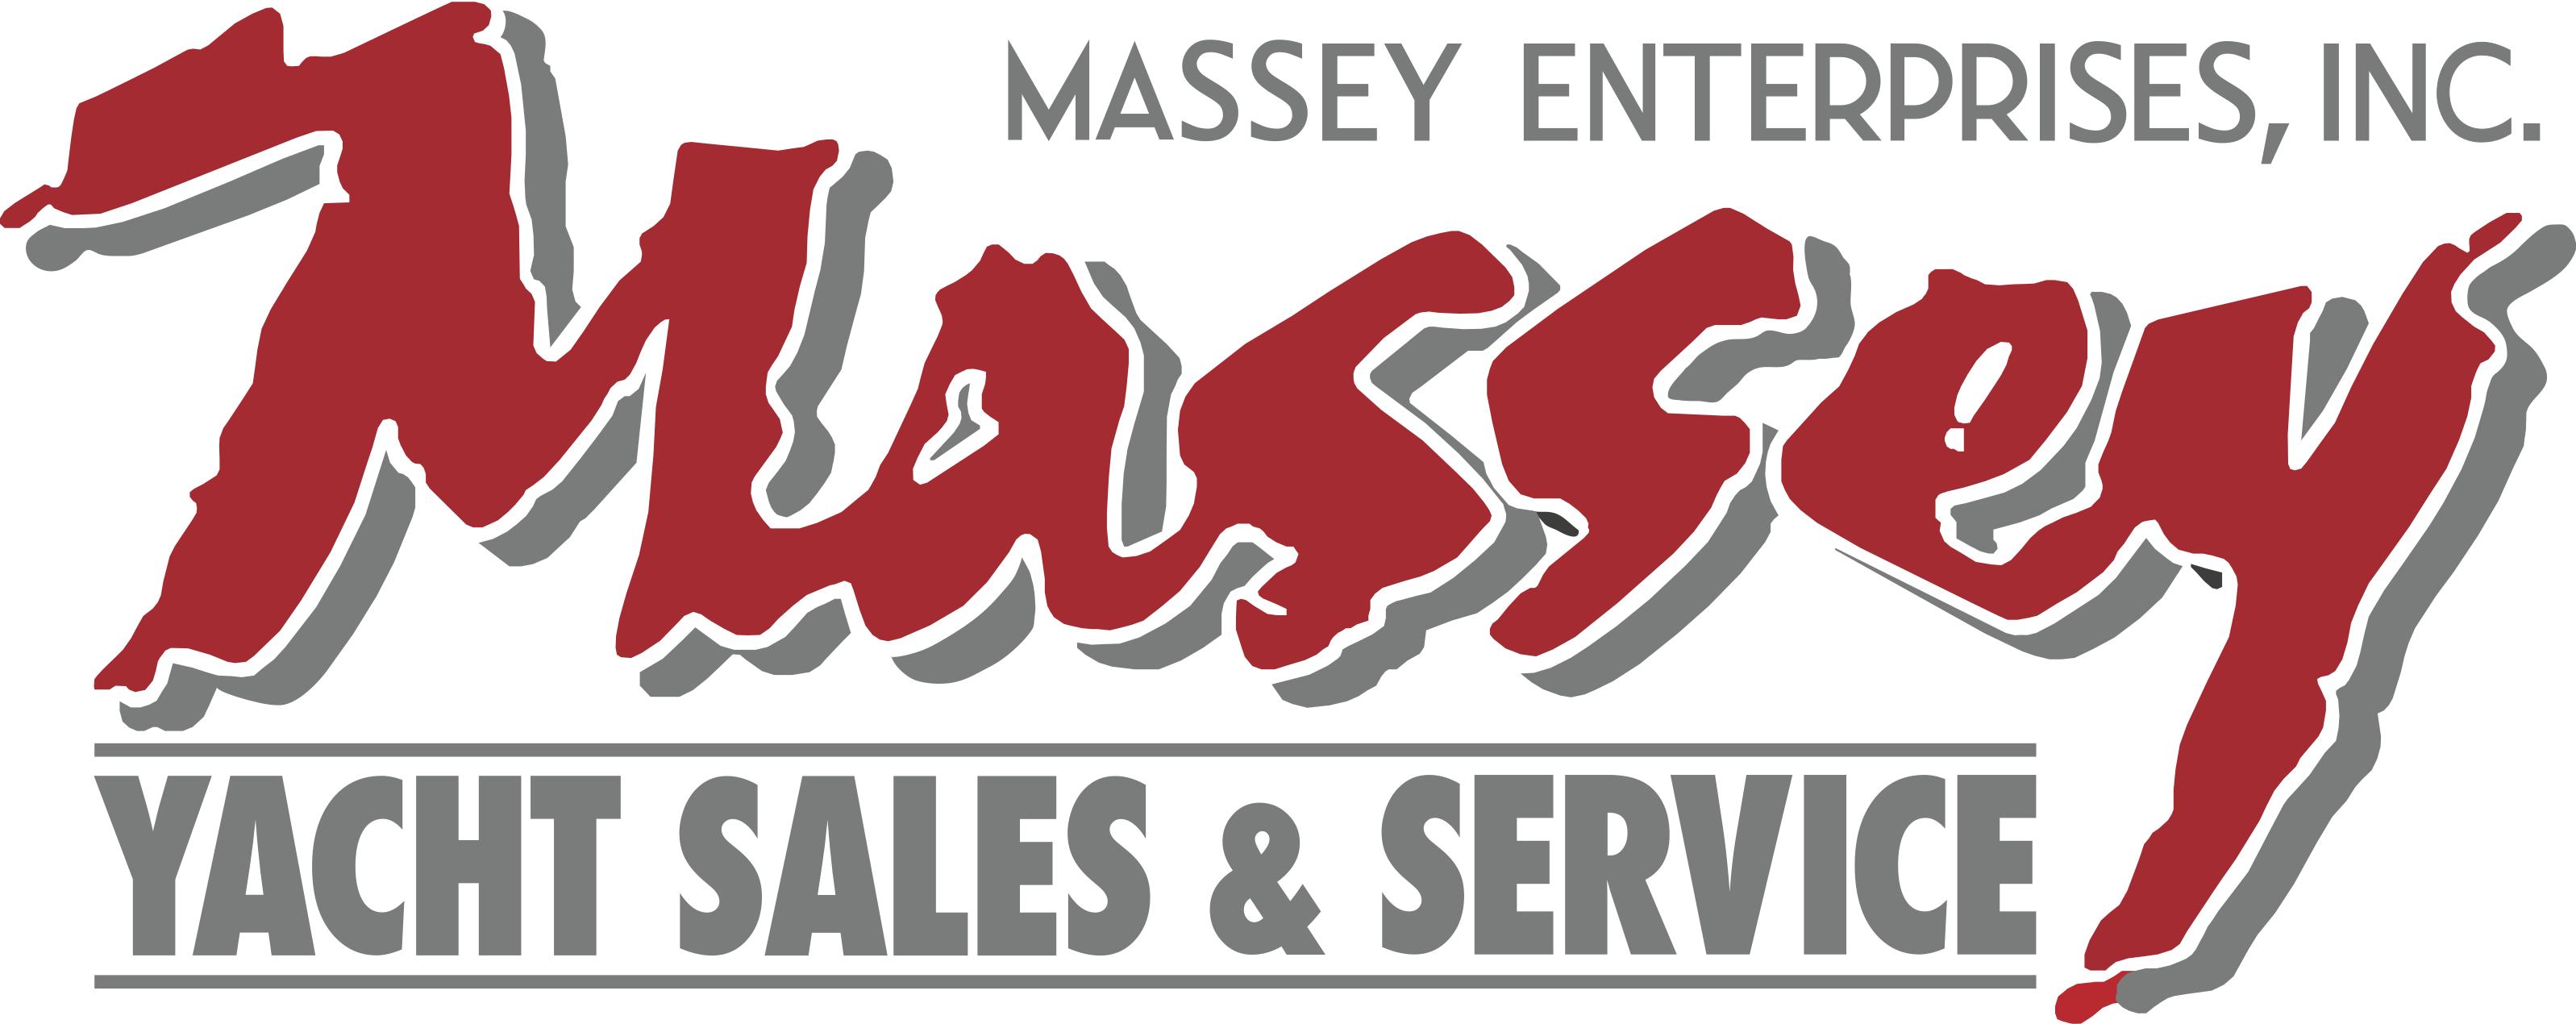 MASSEY YACHT SALES & SERVICE ST. PETERSBURG